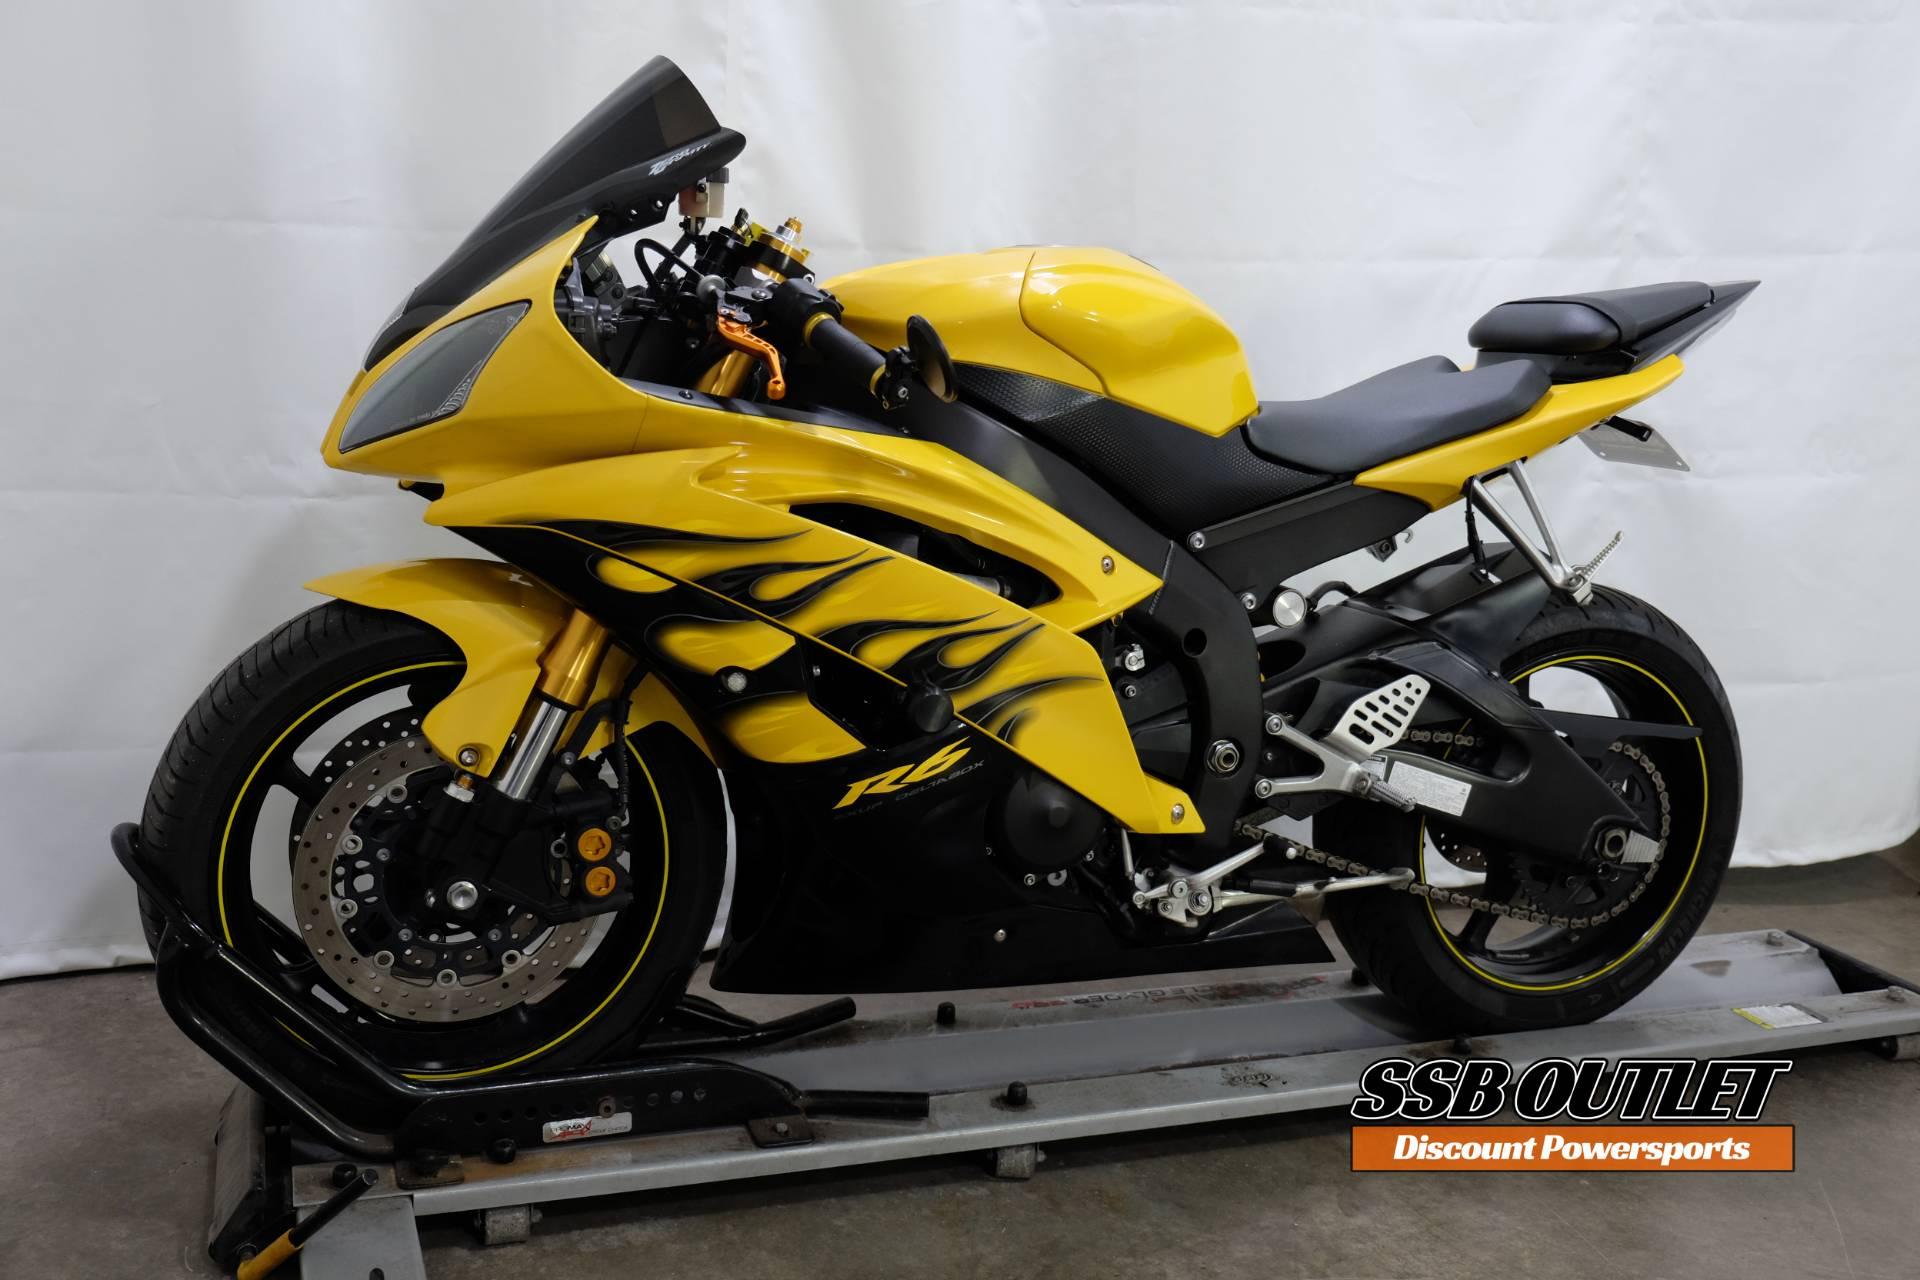 2008 Yamaha YZF-R6 3